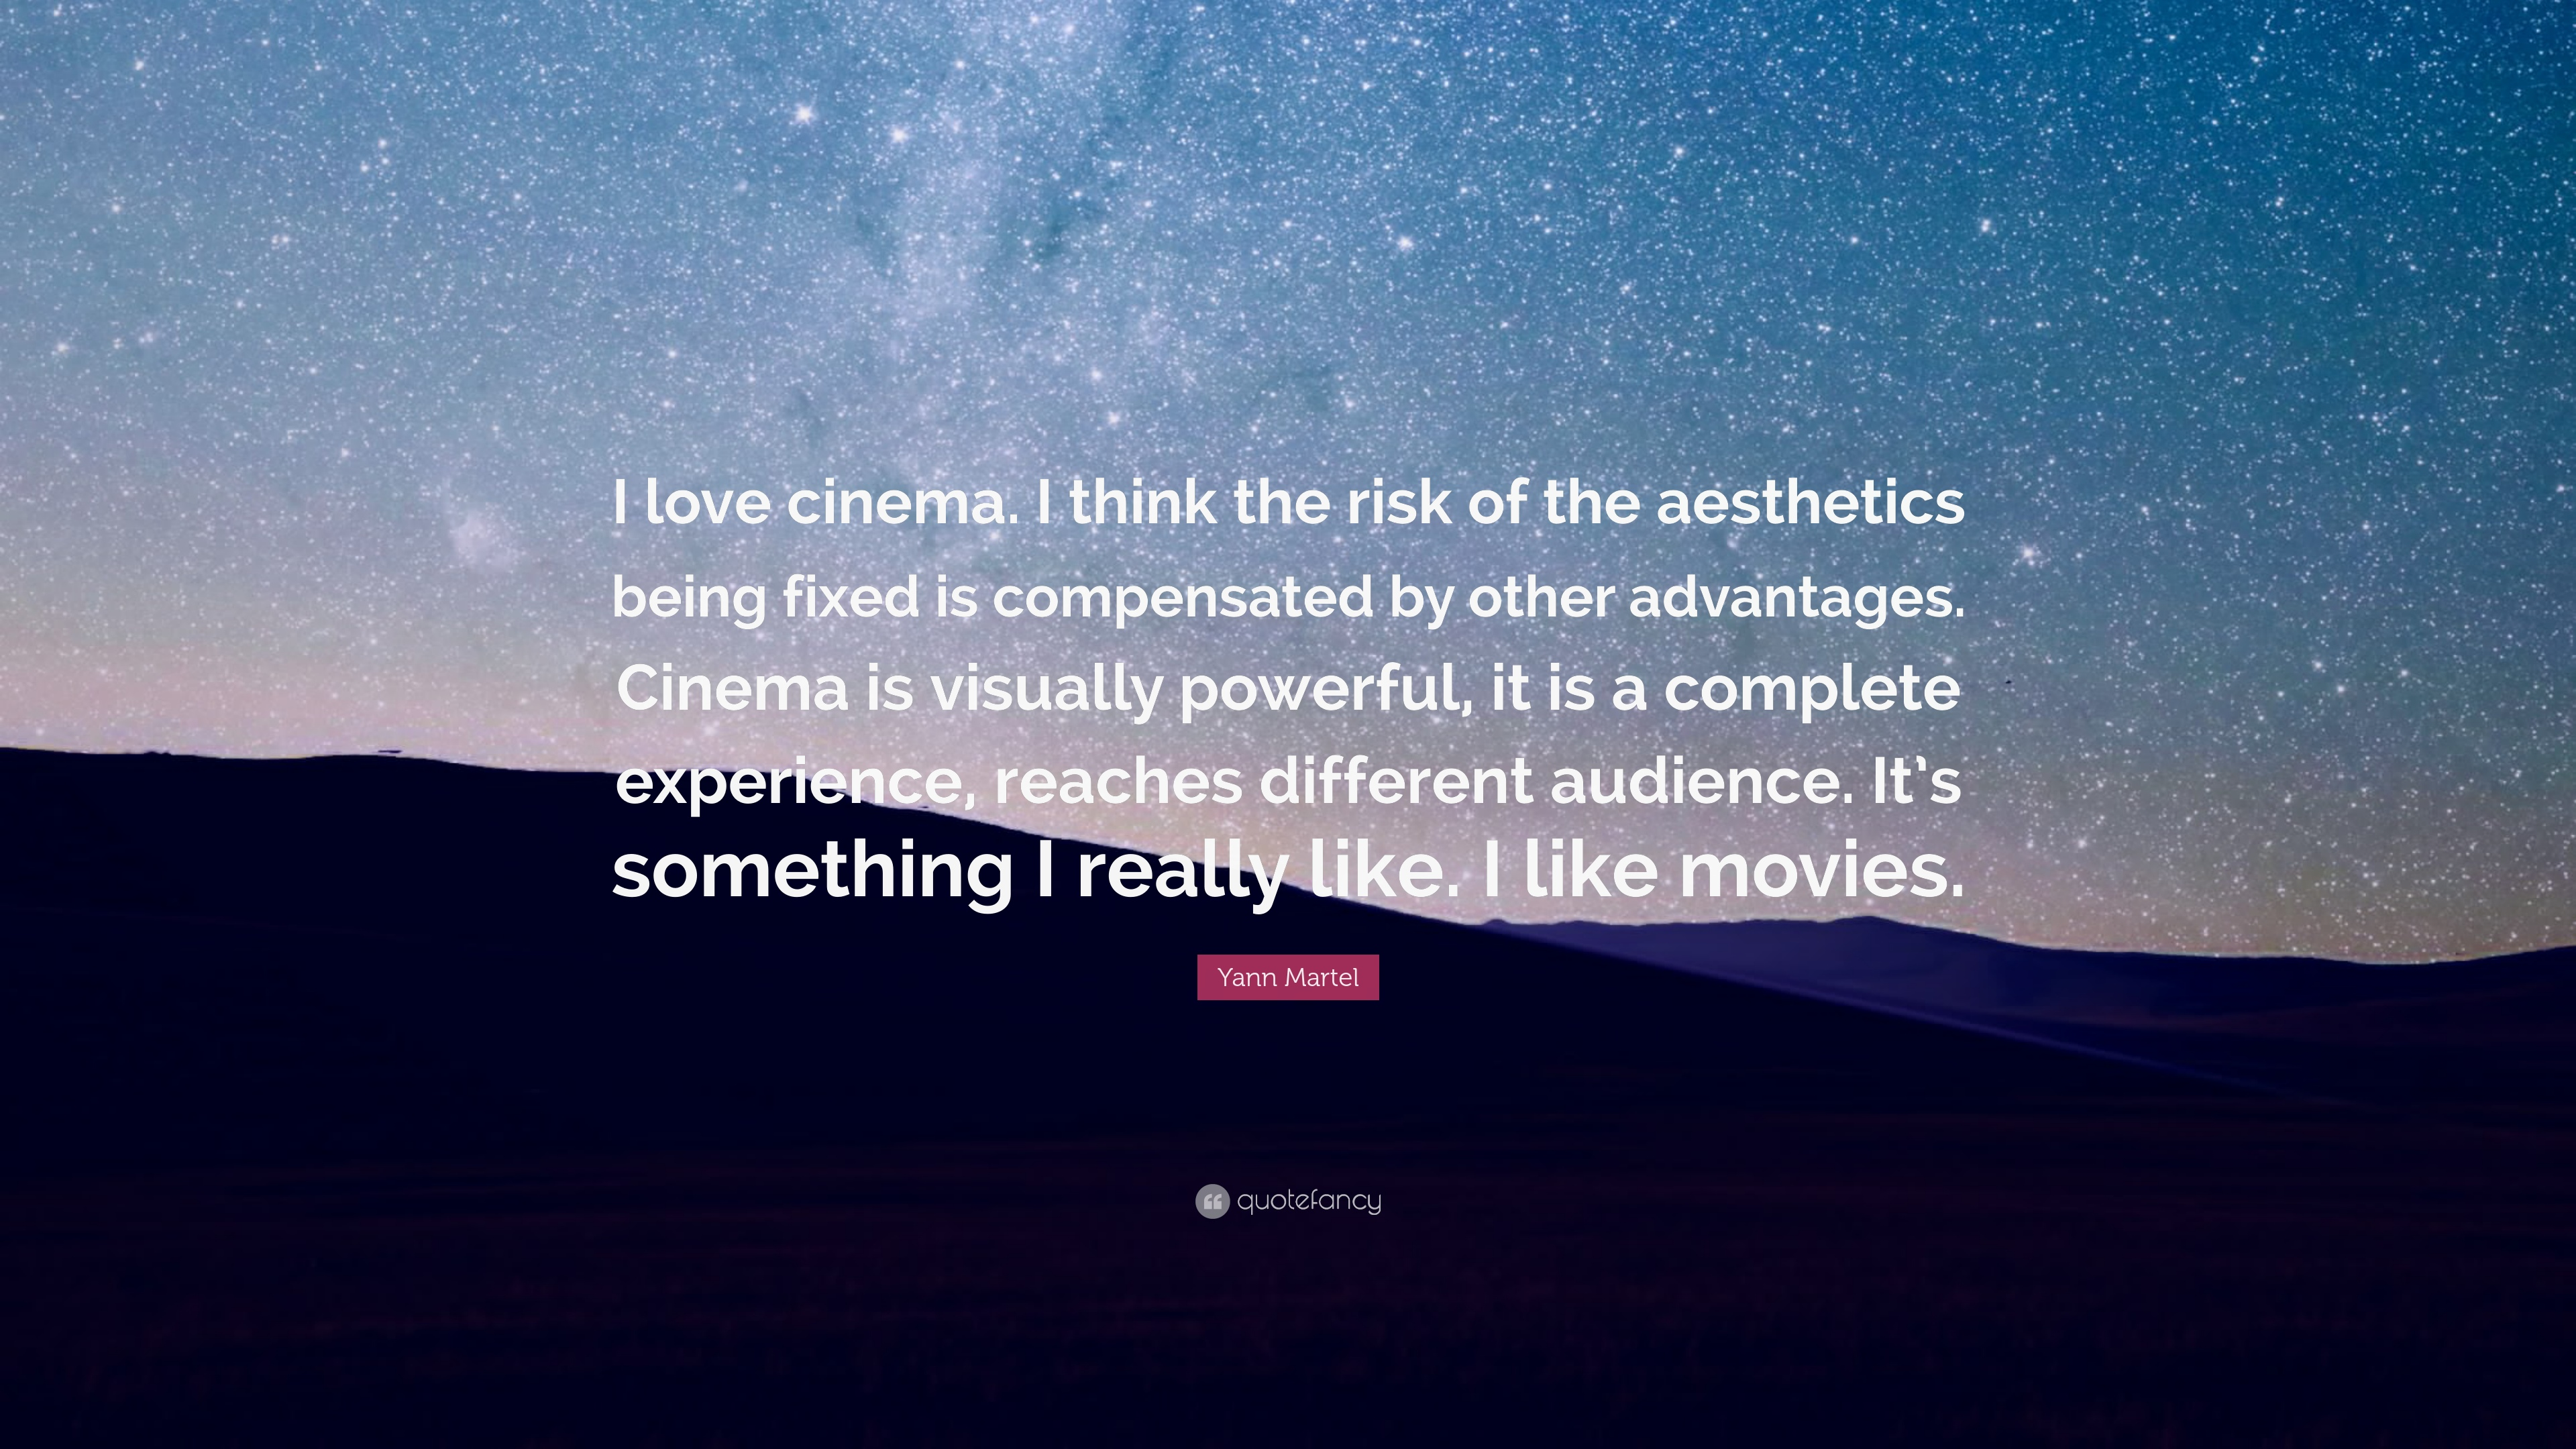 Most Inspiring Wallpaper Love Aesthetic - 83837-Yann-Martel-Quote-I-love-cinema-I-think-the-risk-of-the-aesthetics  Graphic_212276.jpg